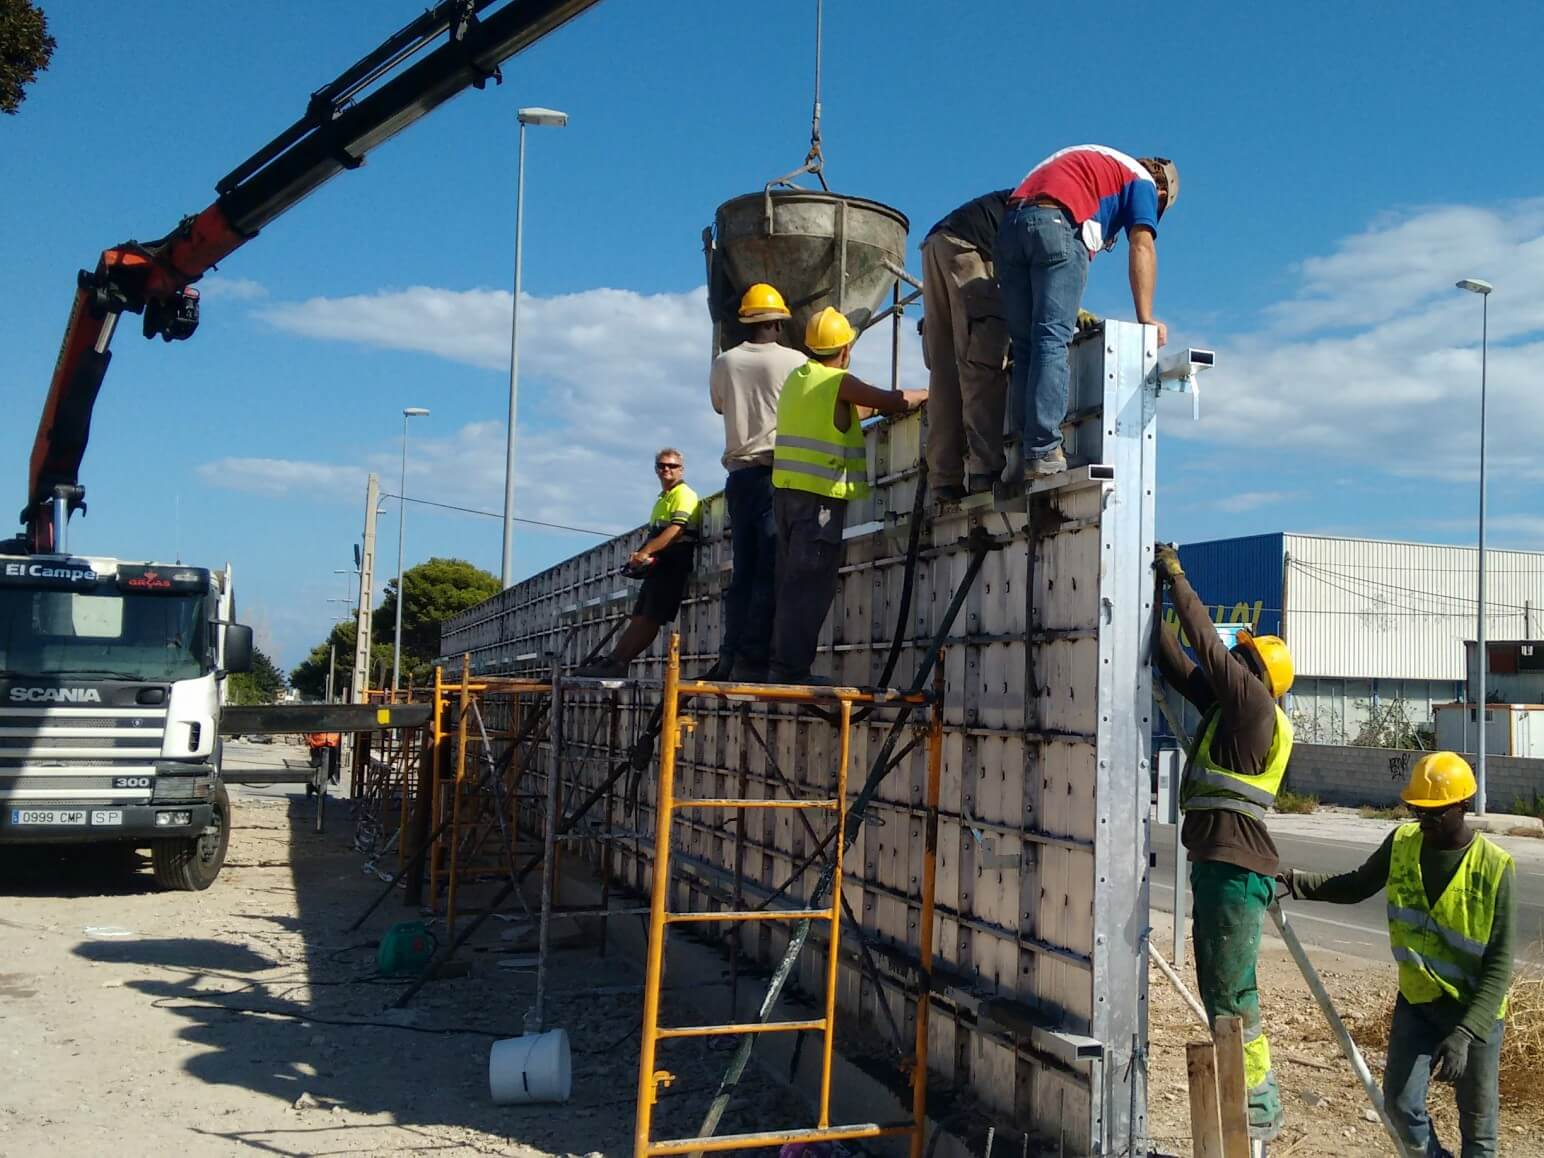 proyecto muro perimetral encofrados de aluminio construccion strong forms alicante 14